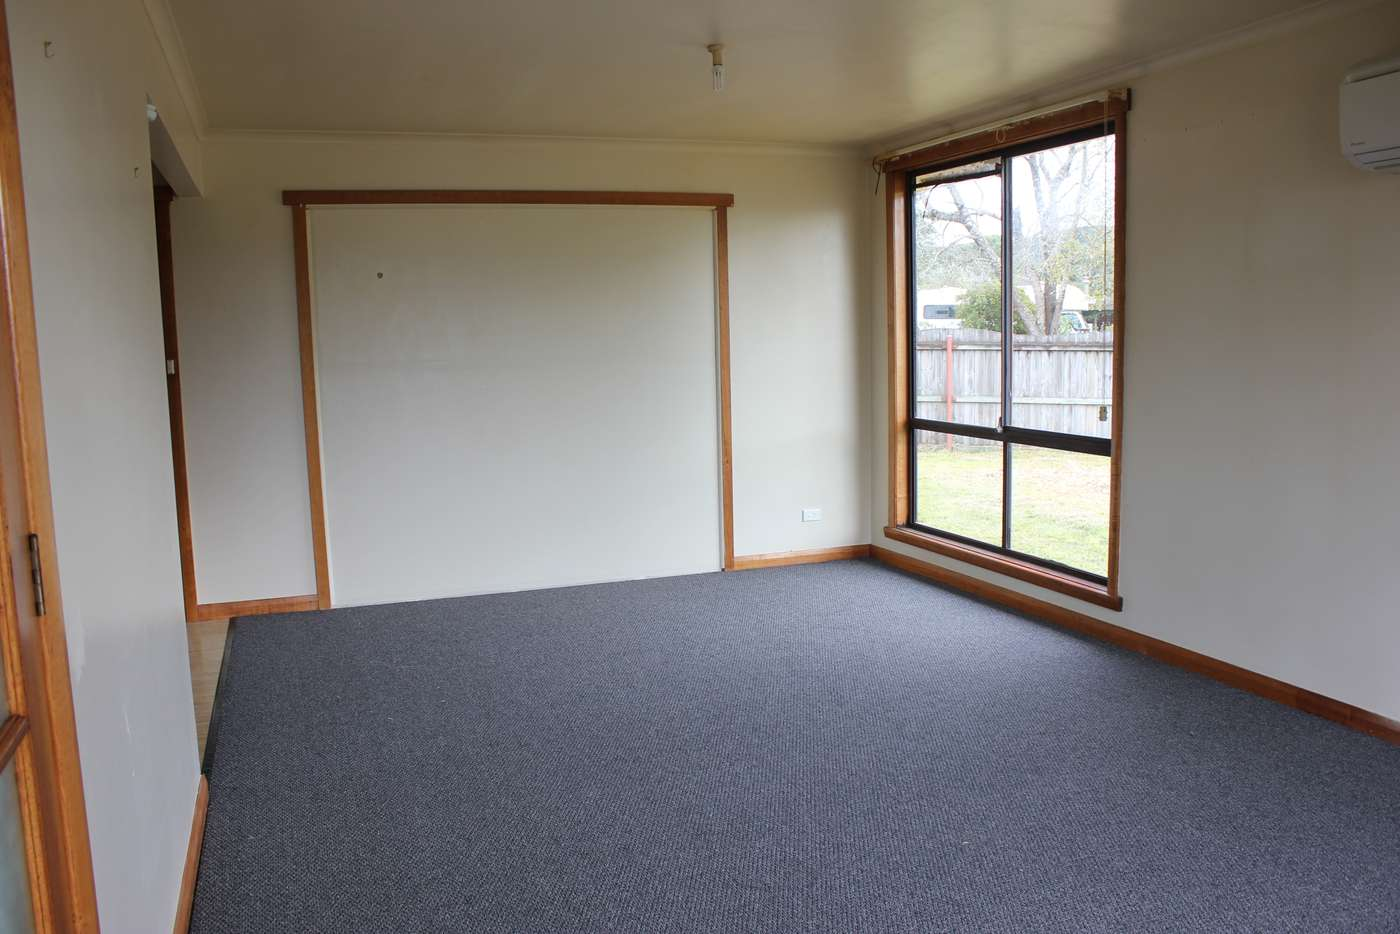 Seventh view of Homely house listing, 17 Shield Street, Zeehan TAS 7469